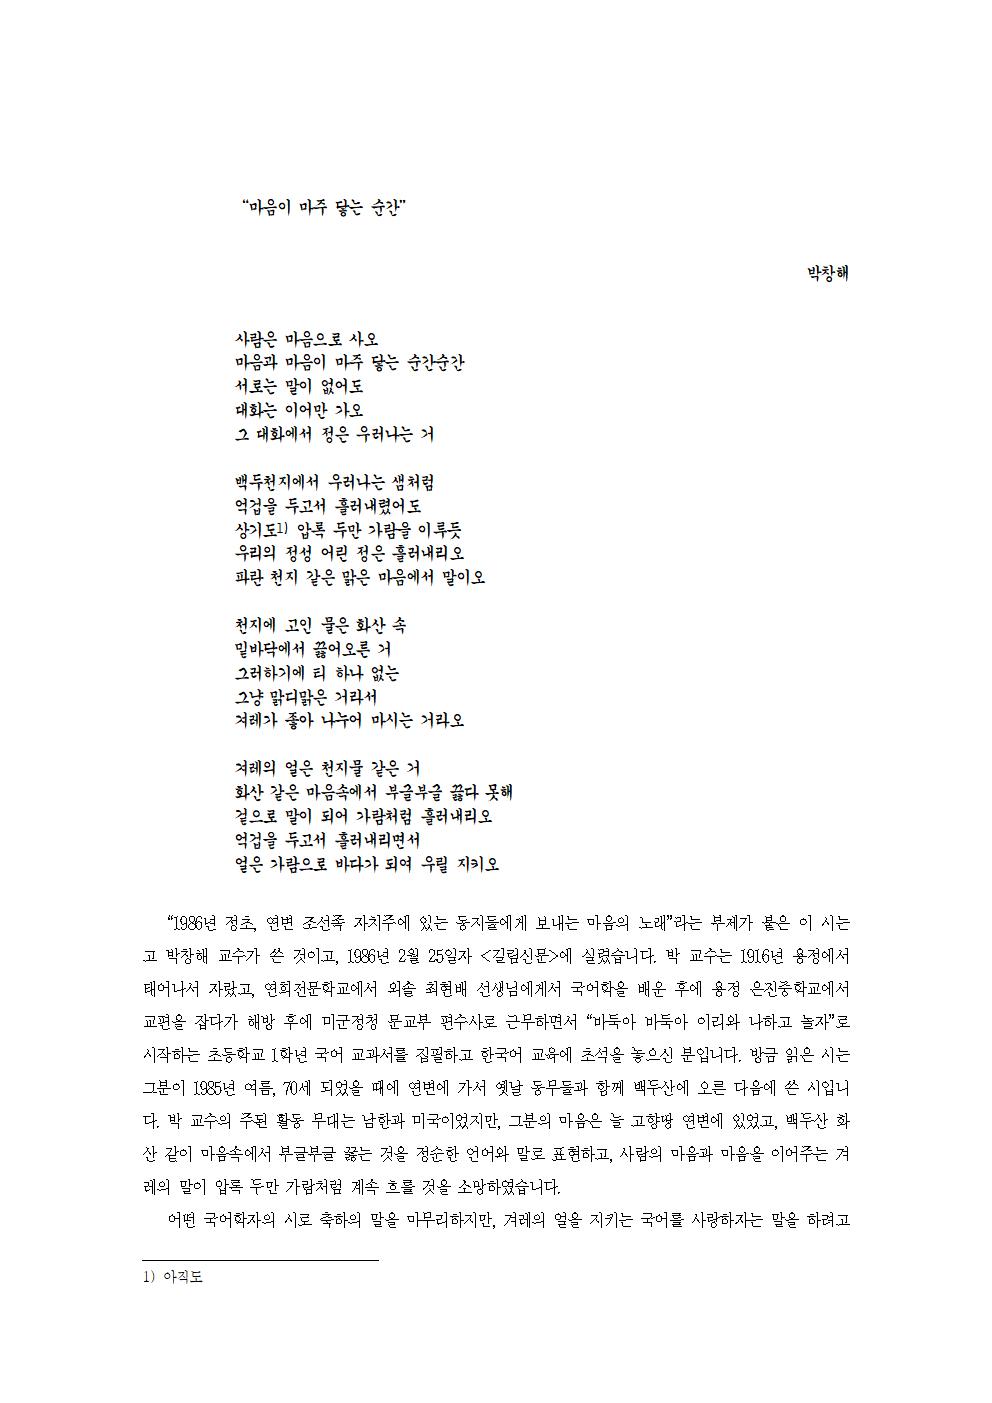 O 전도사 환영인사003.png